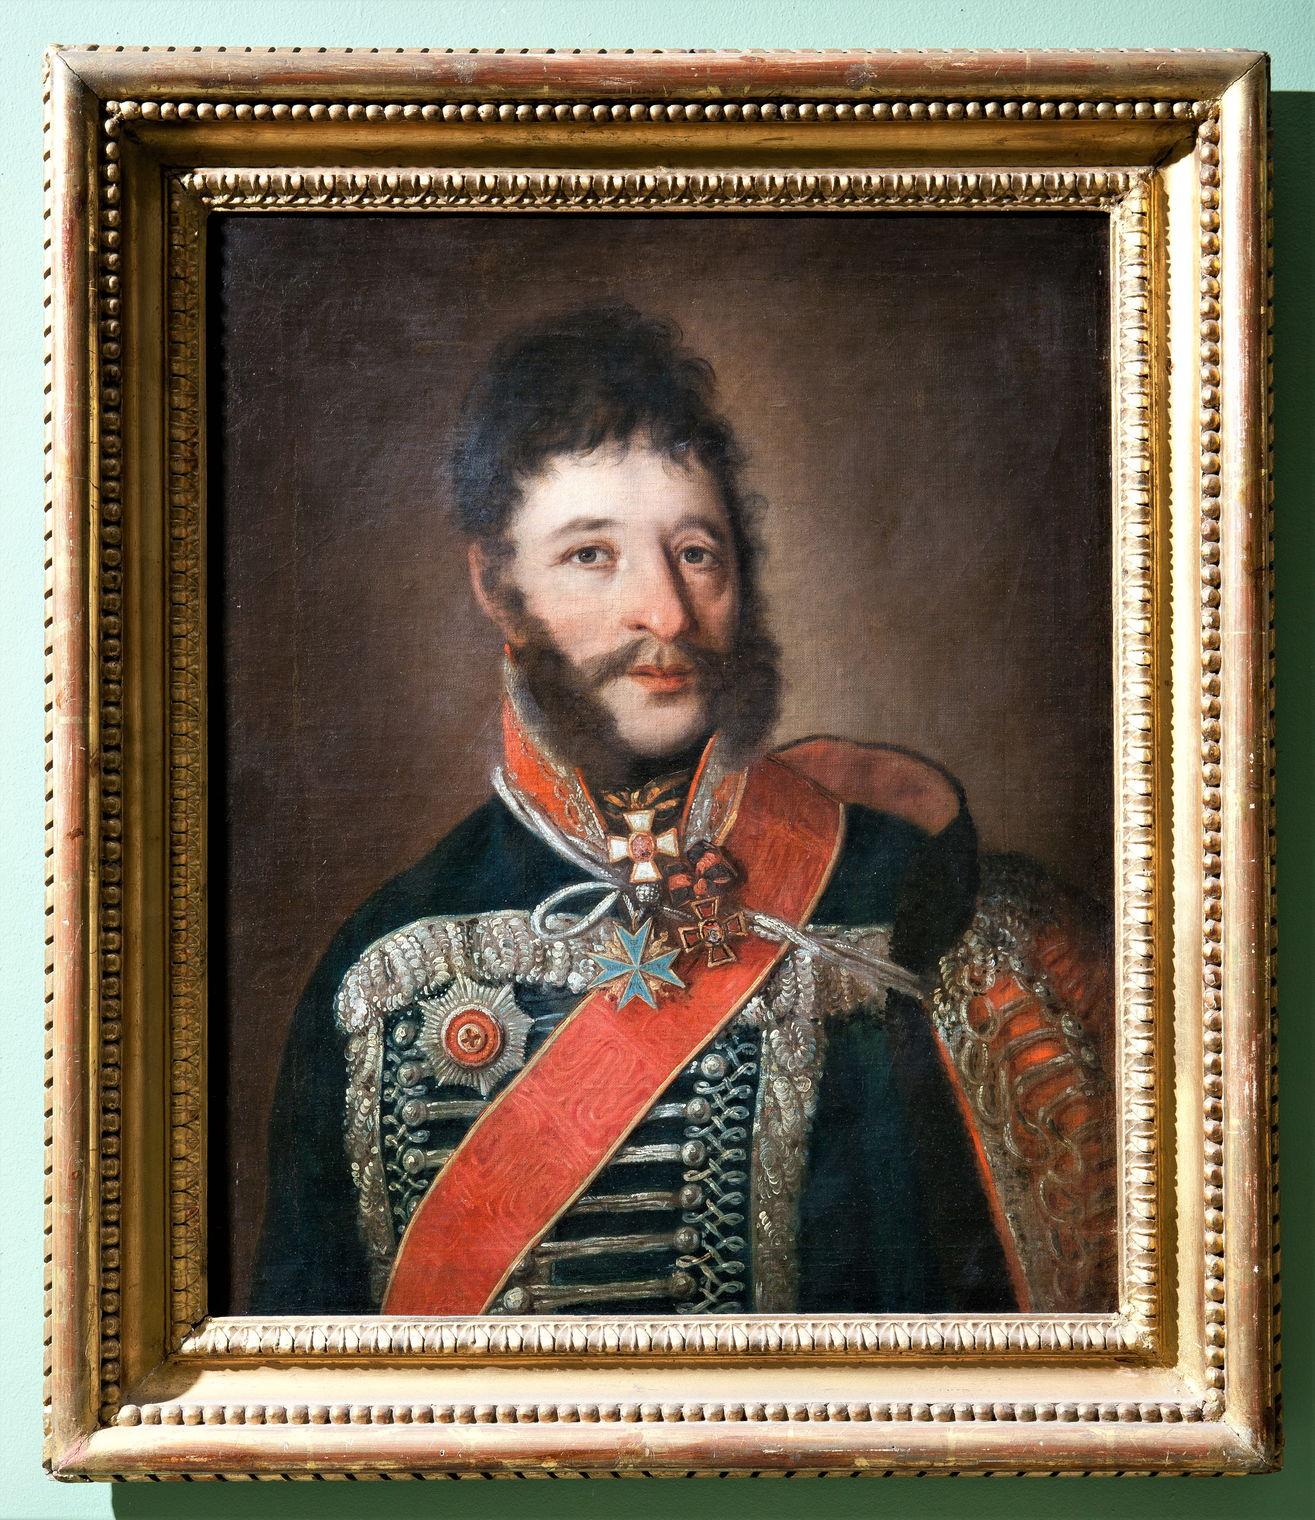 Неизвестный художник Портрет Я.П. Кульнева. Начало 1810-х Холст, масло. 65,5х51,1